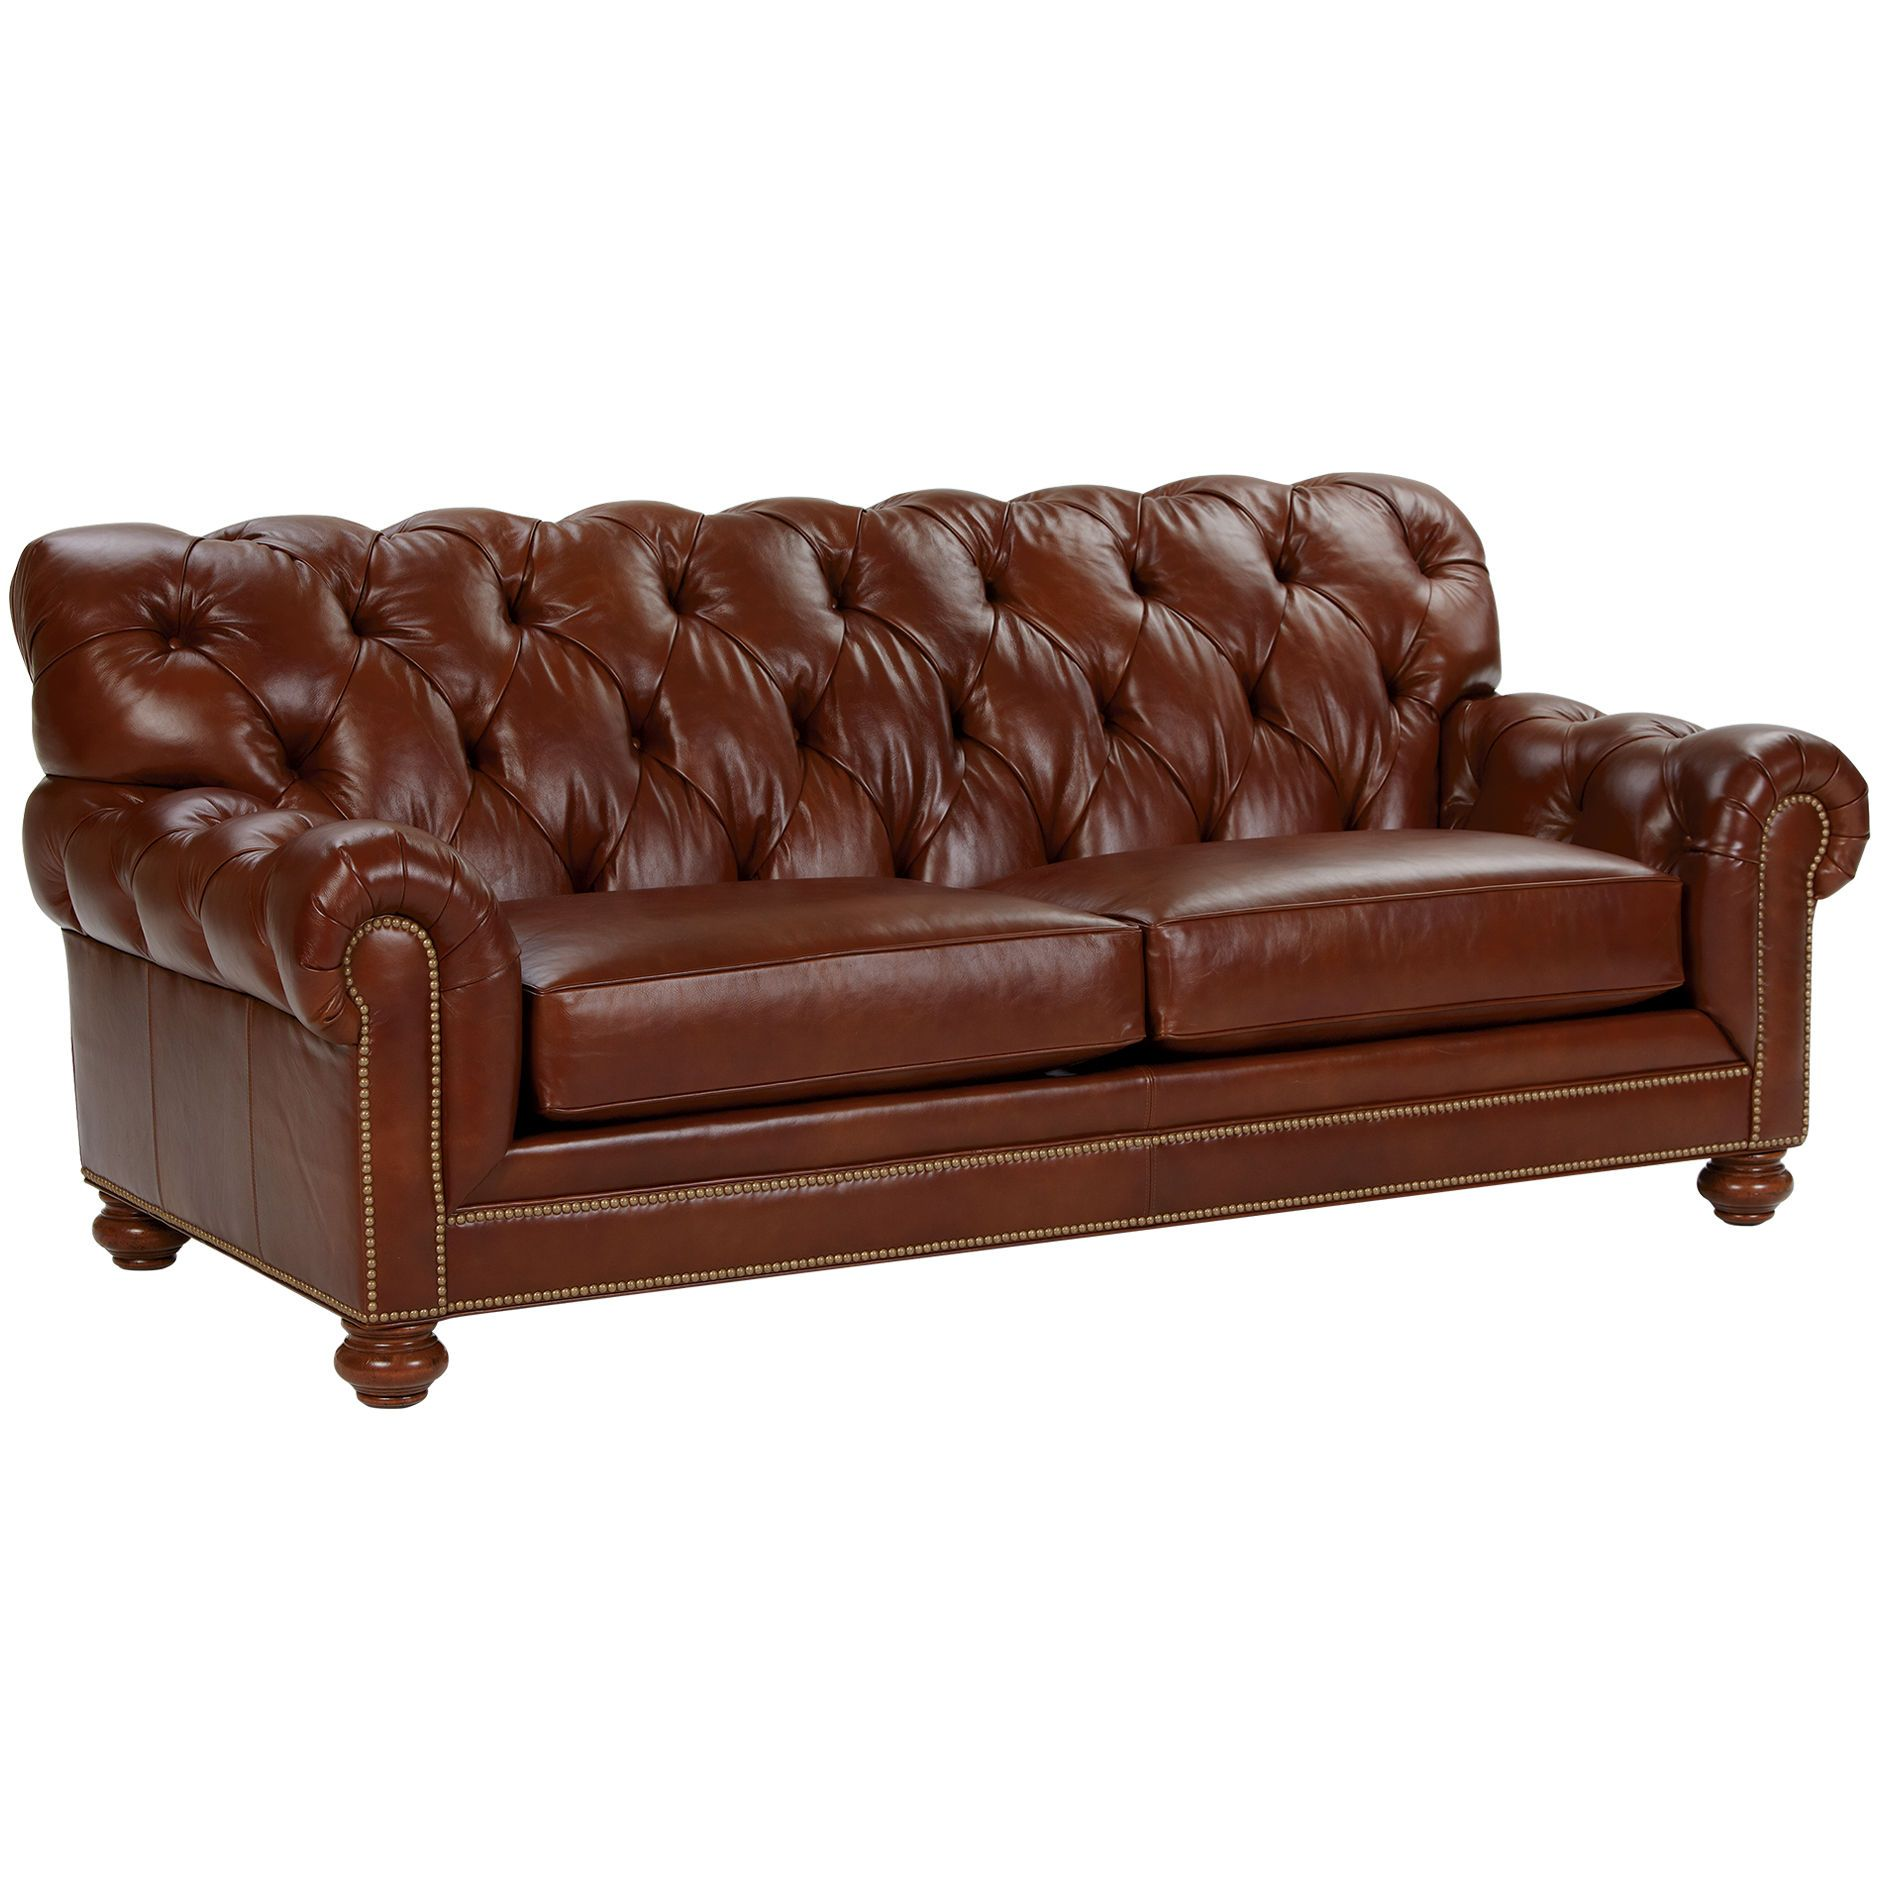 Chadwick Leather Sofa Old English Saddle Ethan Allen Us